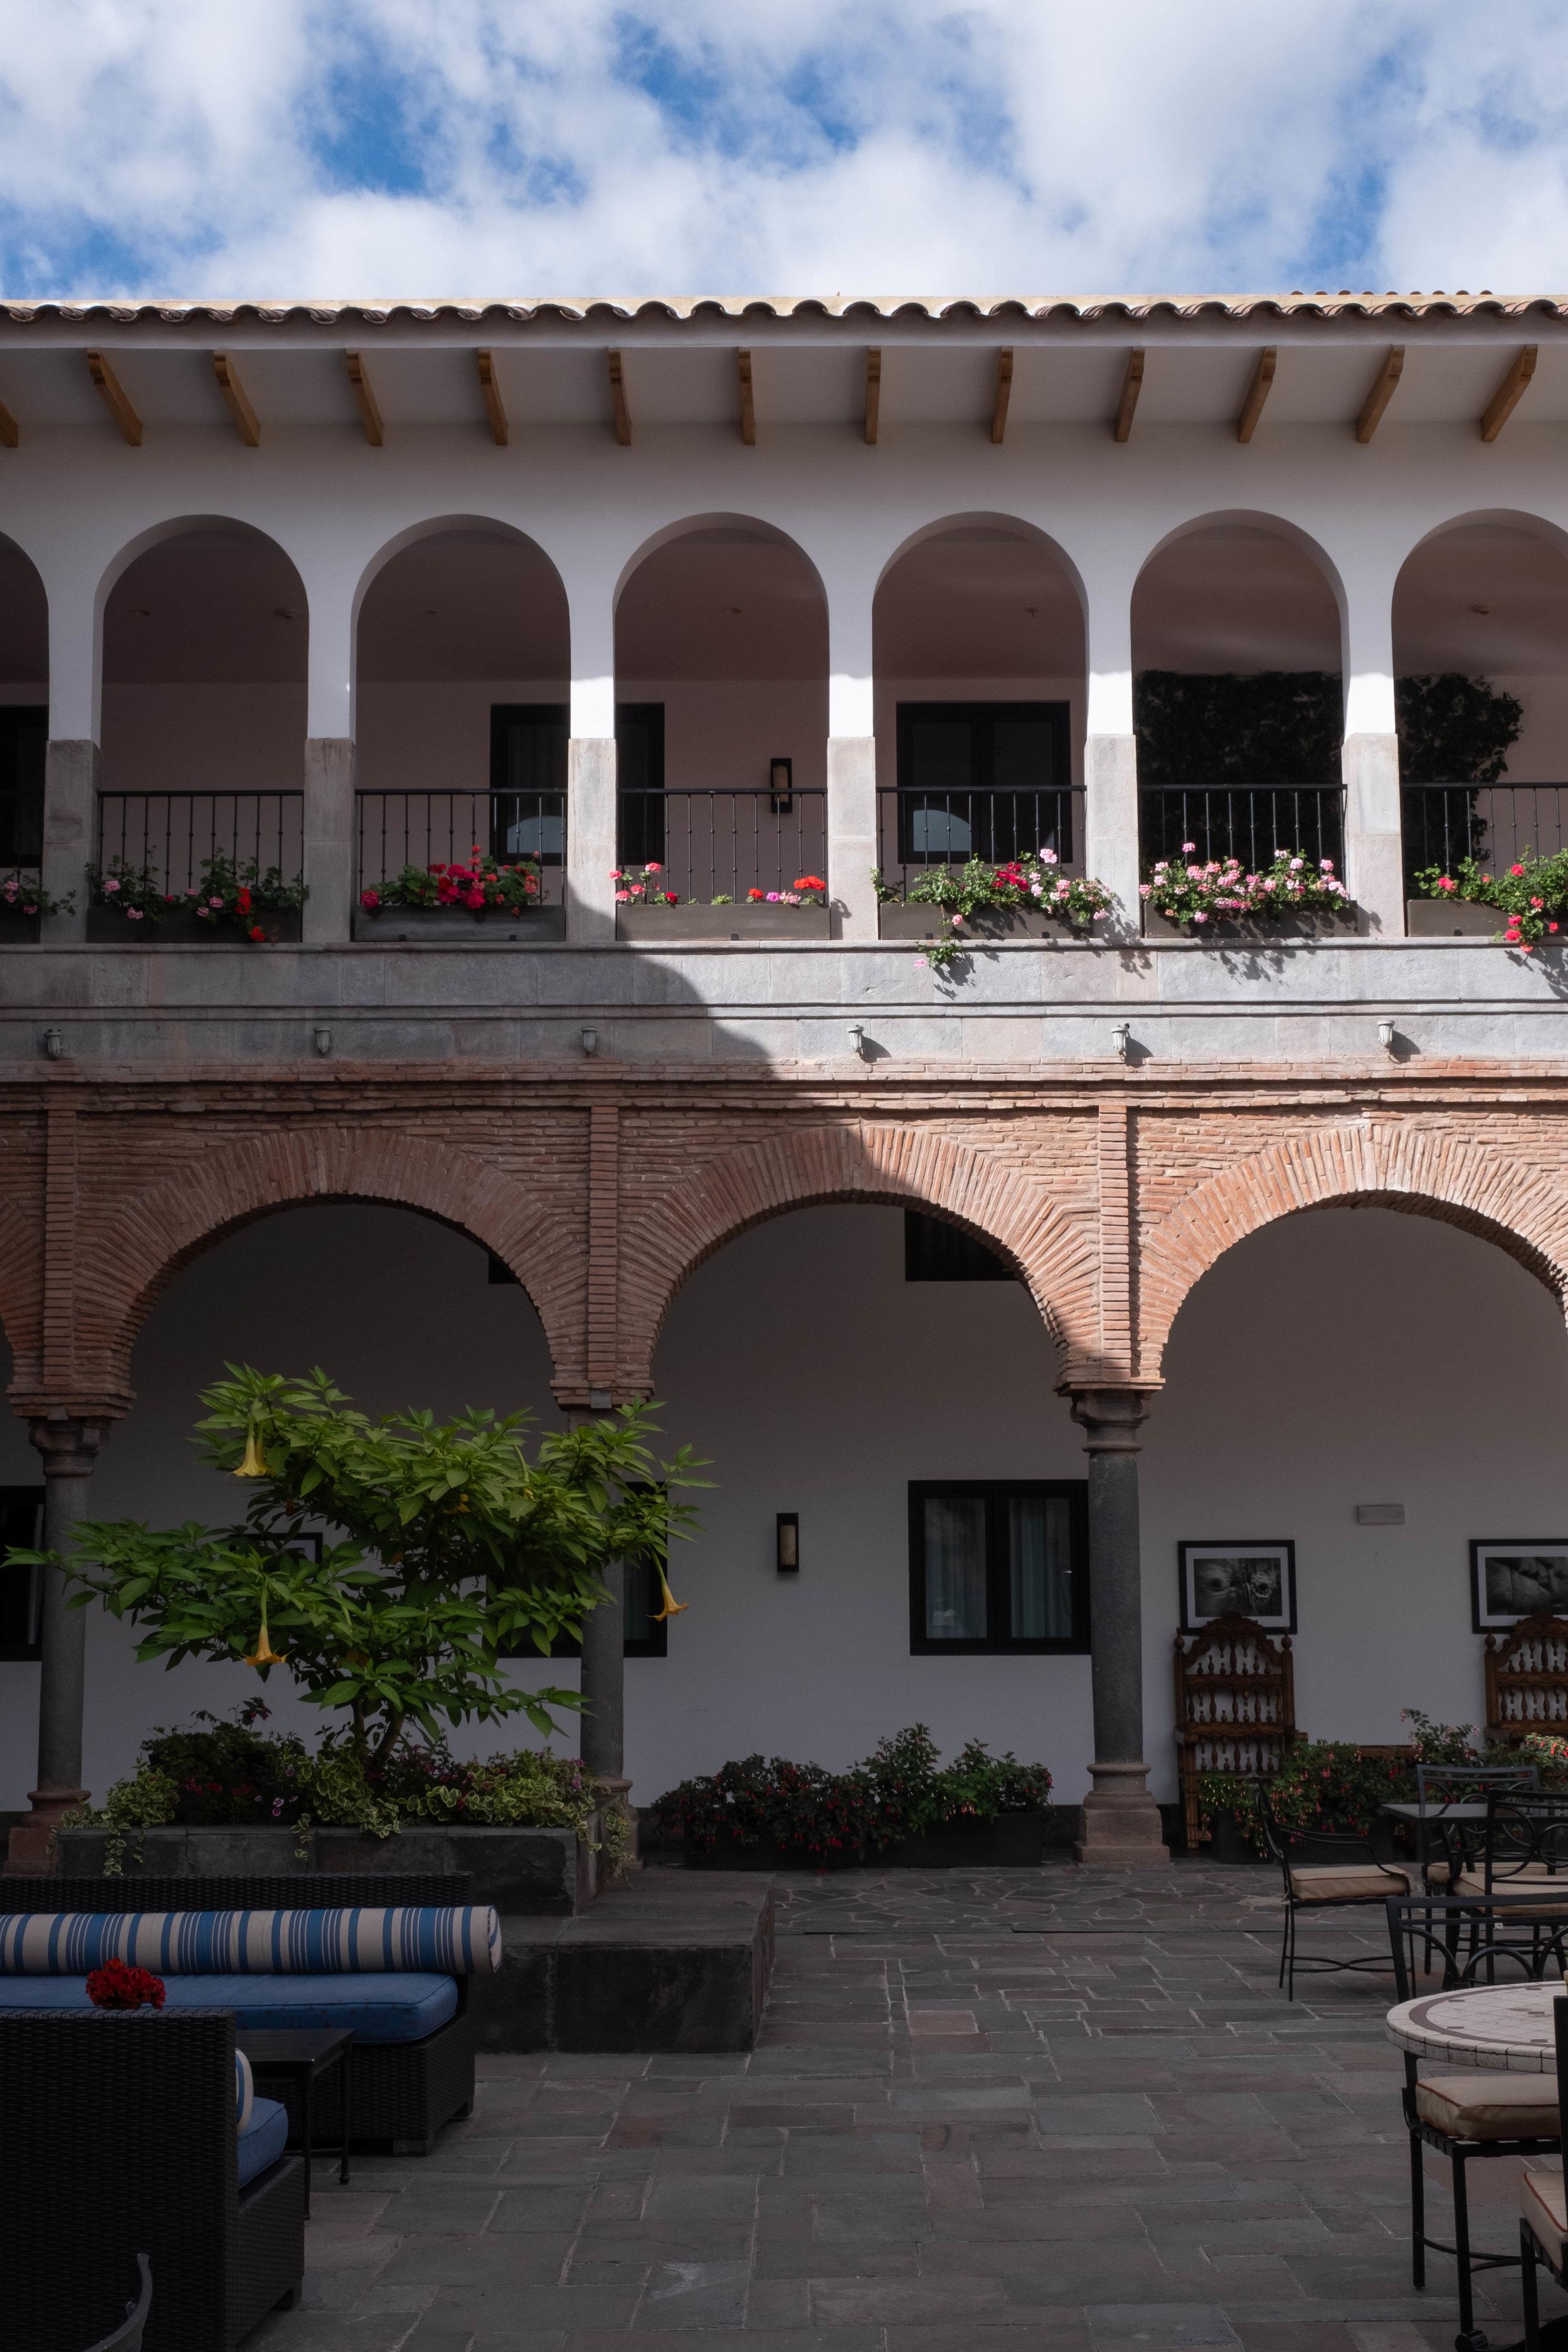 ROSE & IVY Checking Into JW Marriott El Convento Cusco